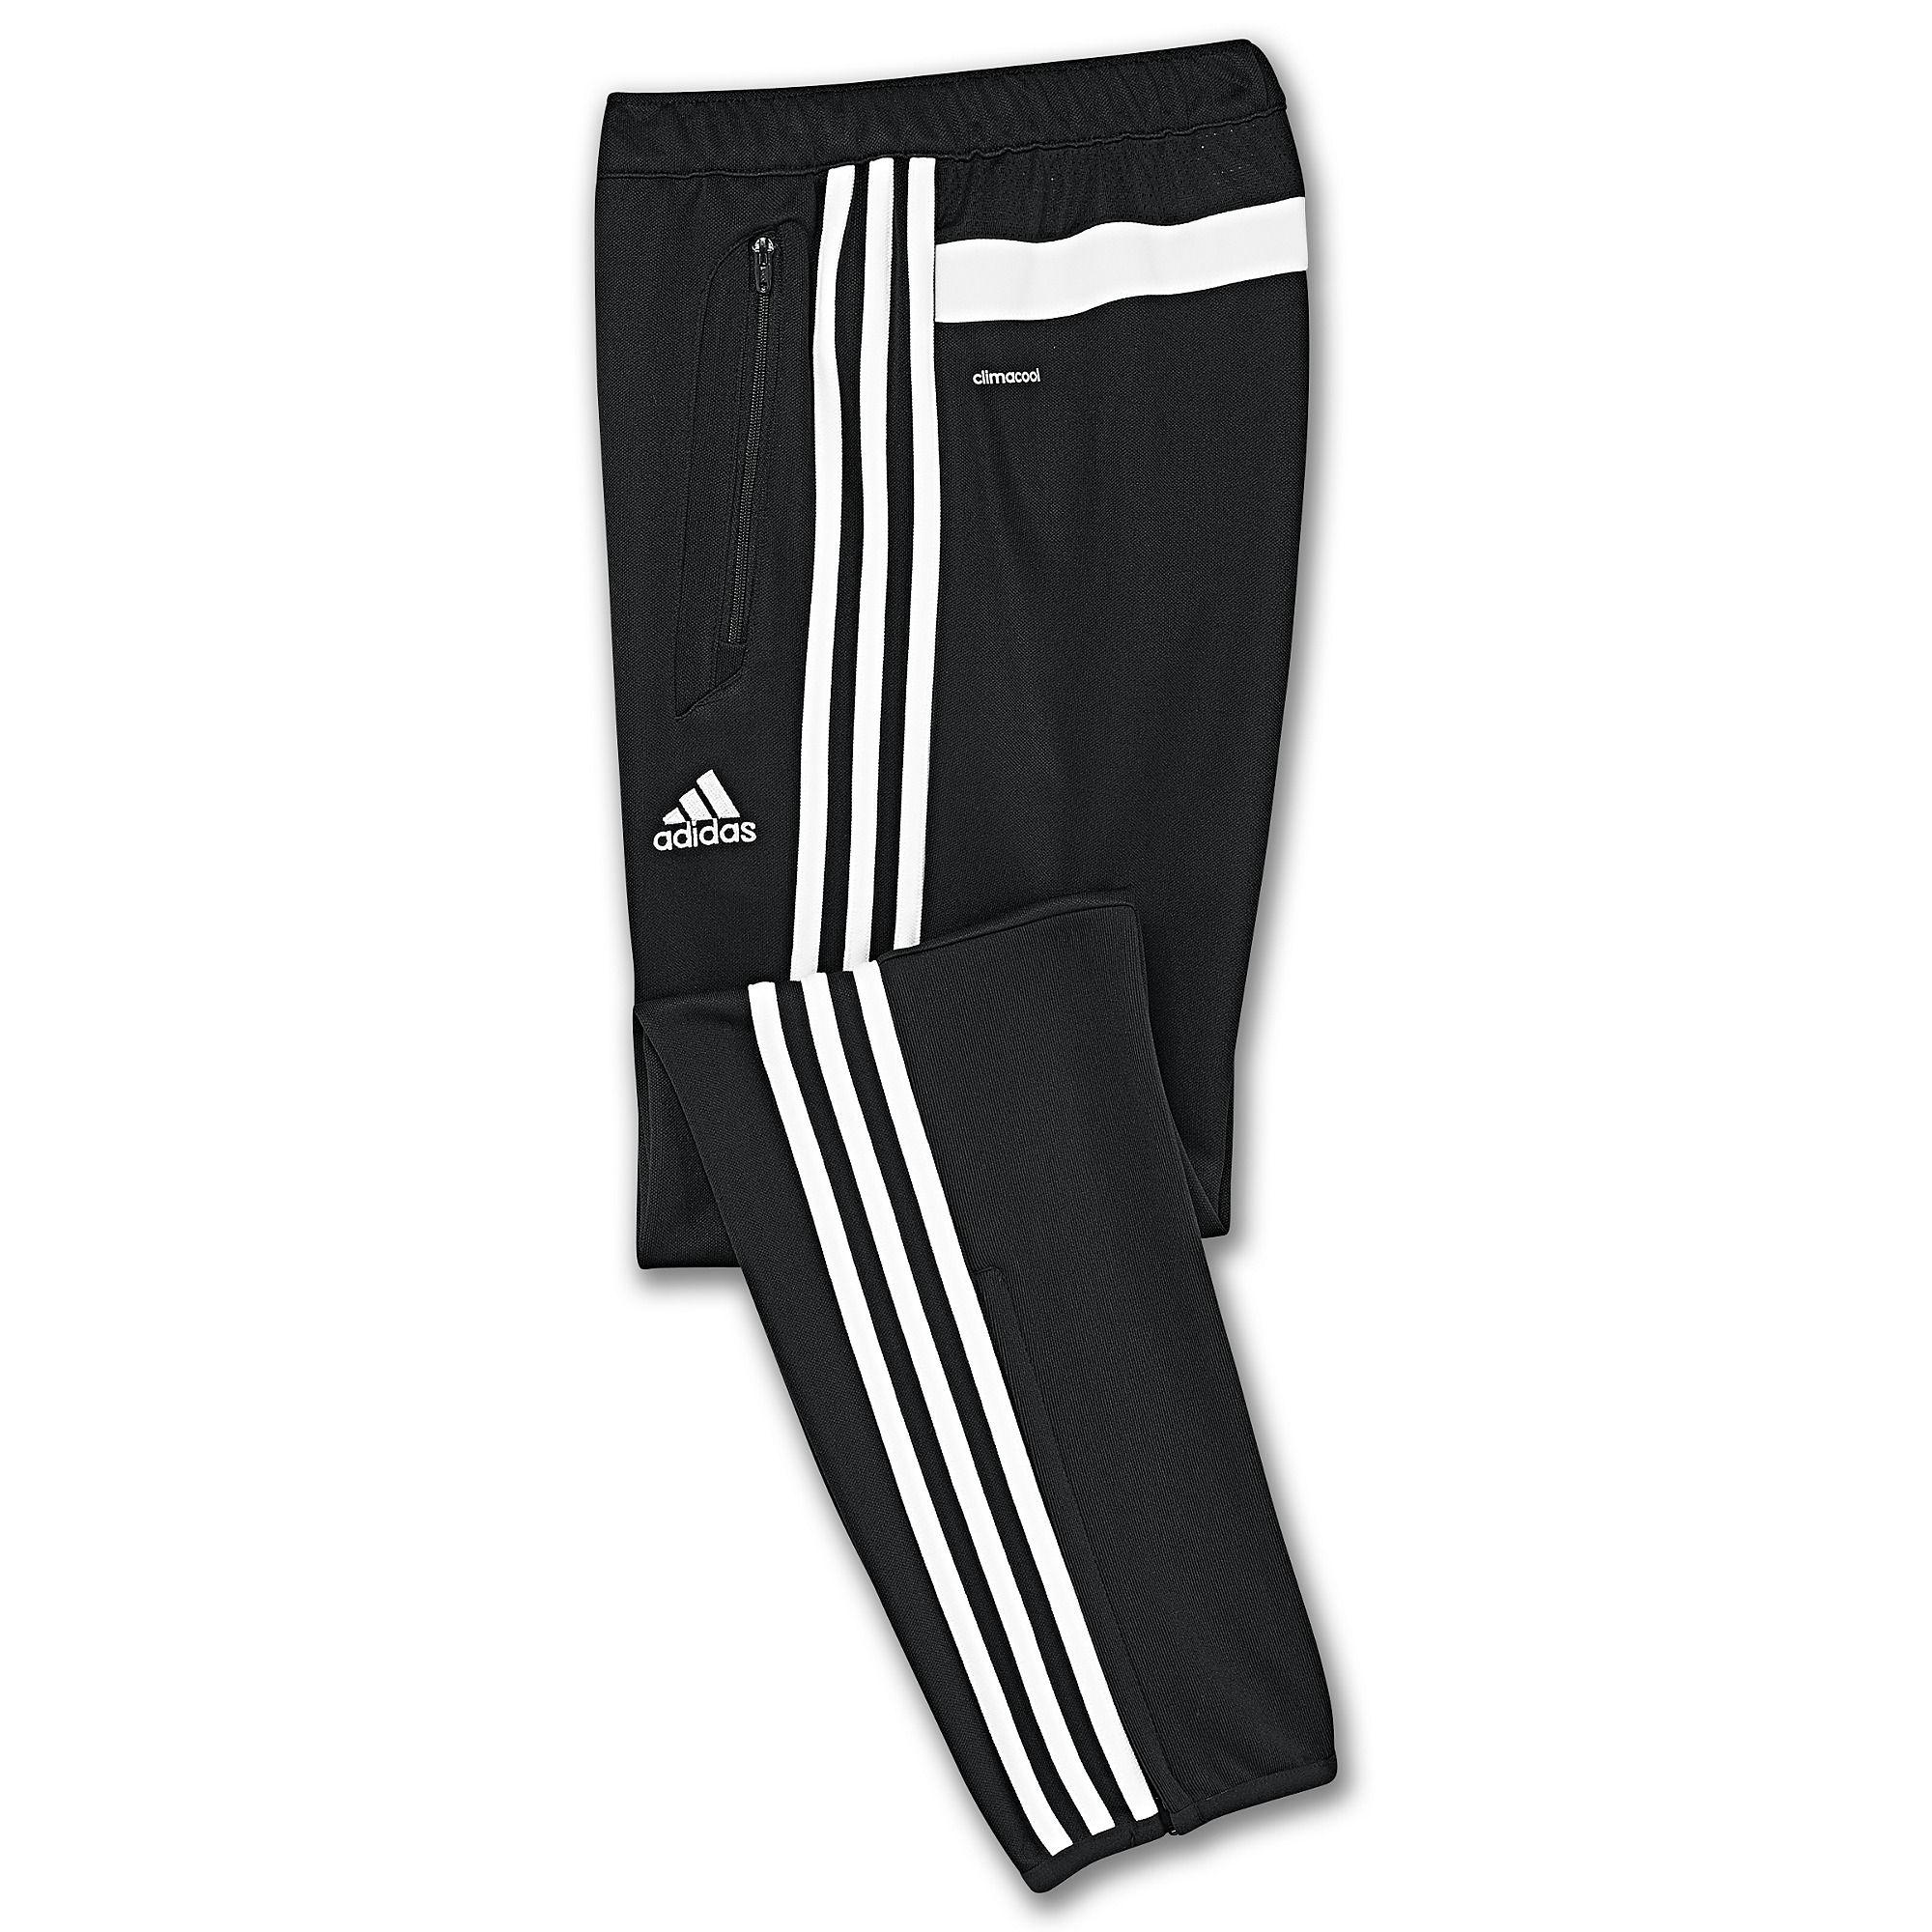 e0cad1fdf adidas men's tiro 13 soccer training pants daa44ba853a2745b702fa80a89059682